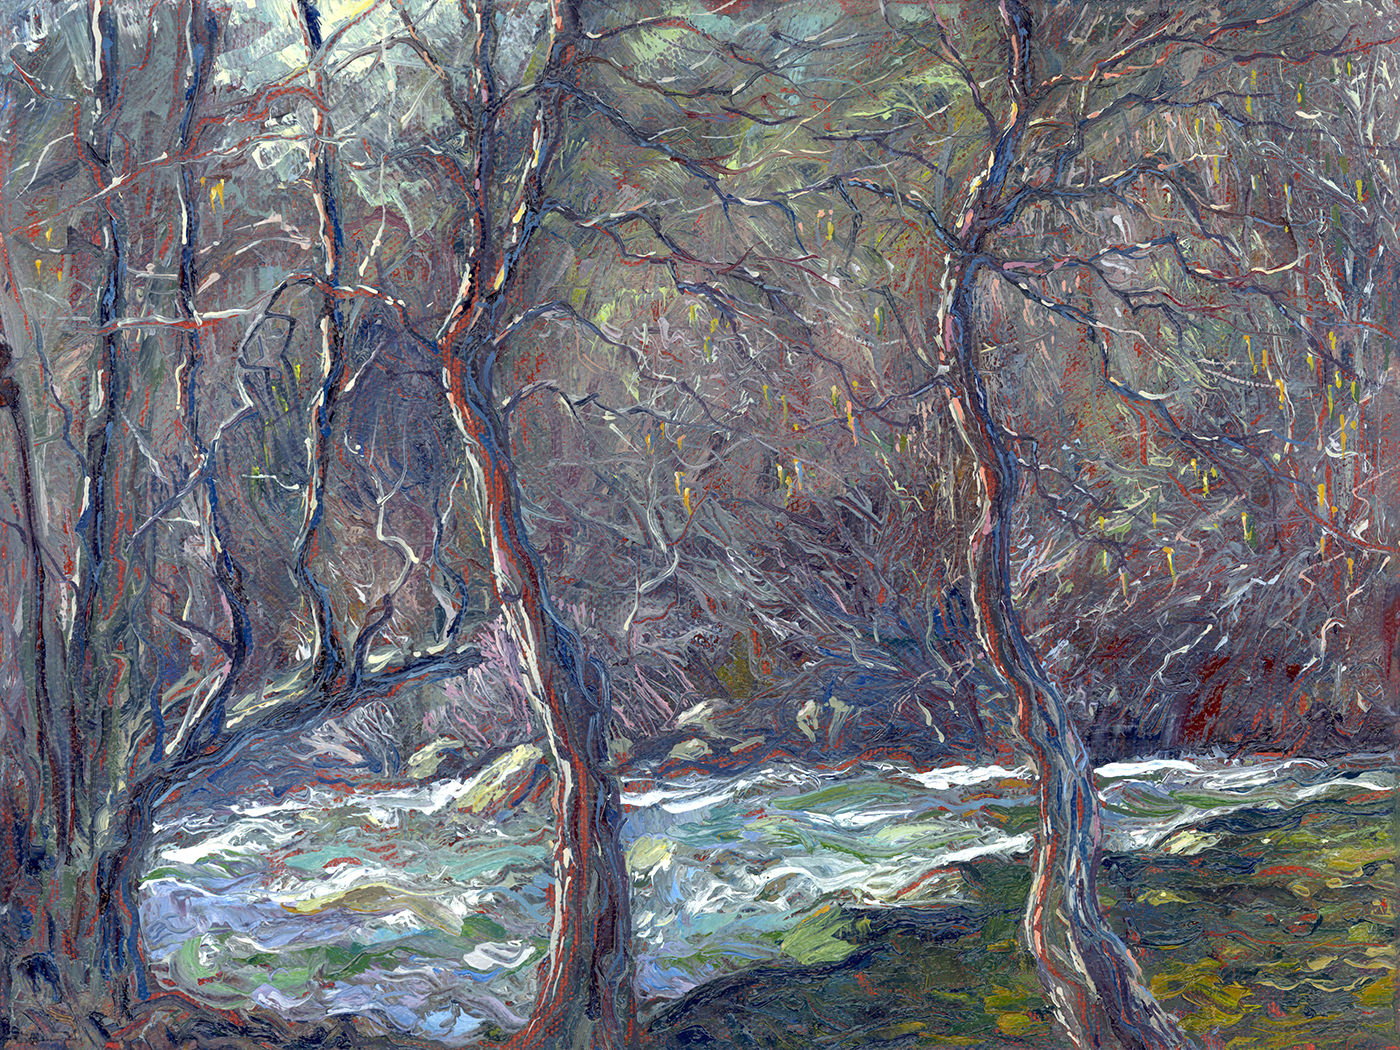 White Alders on the Consumnes River